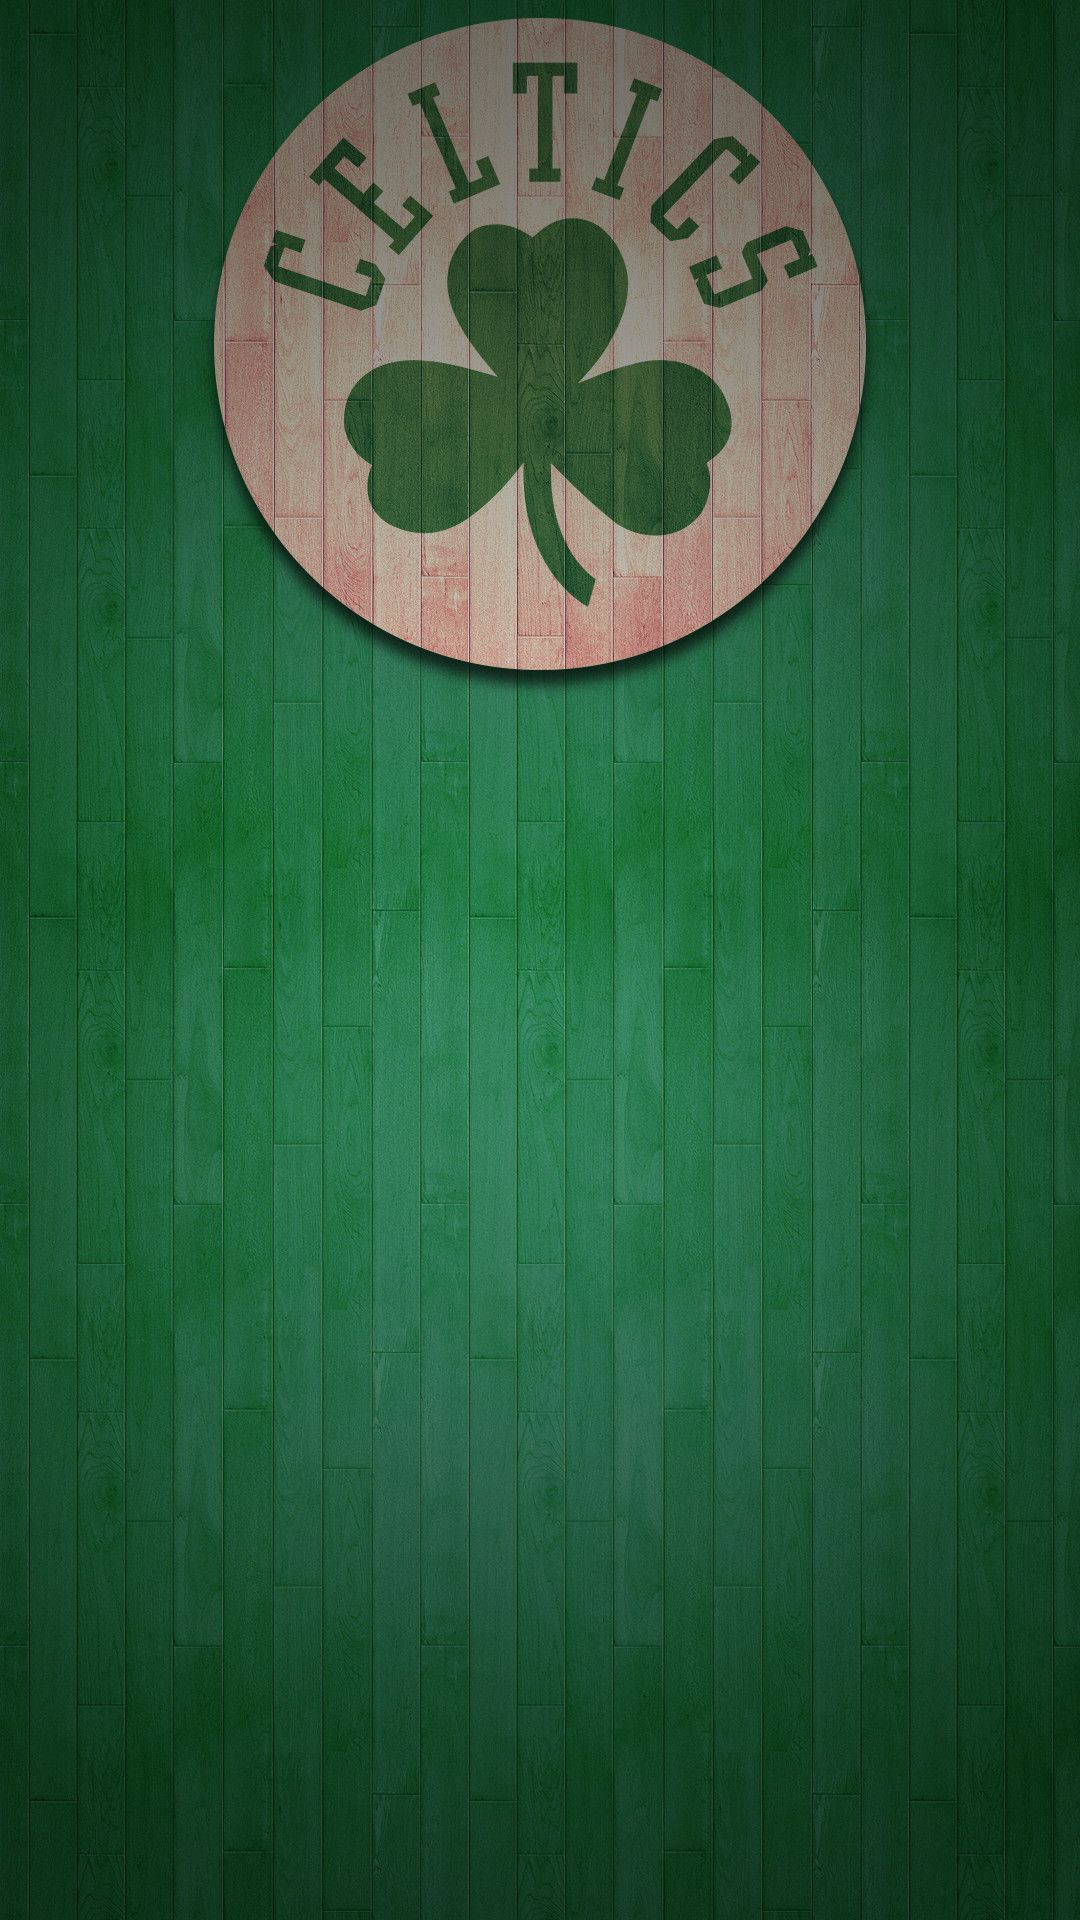 Boston Celtics Wallpapers Top Free Boston Celtics